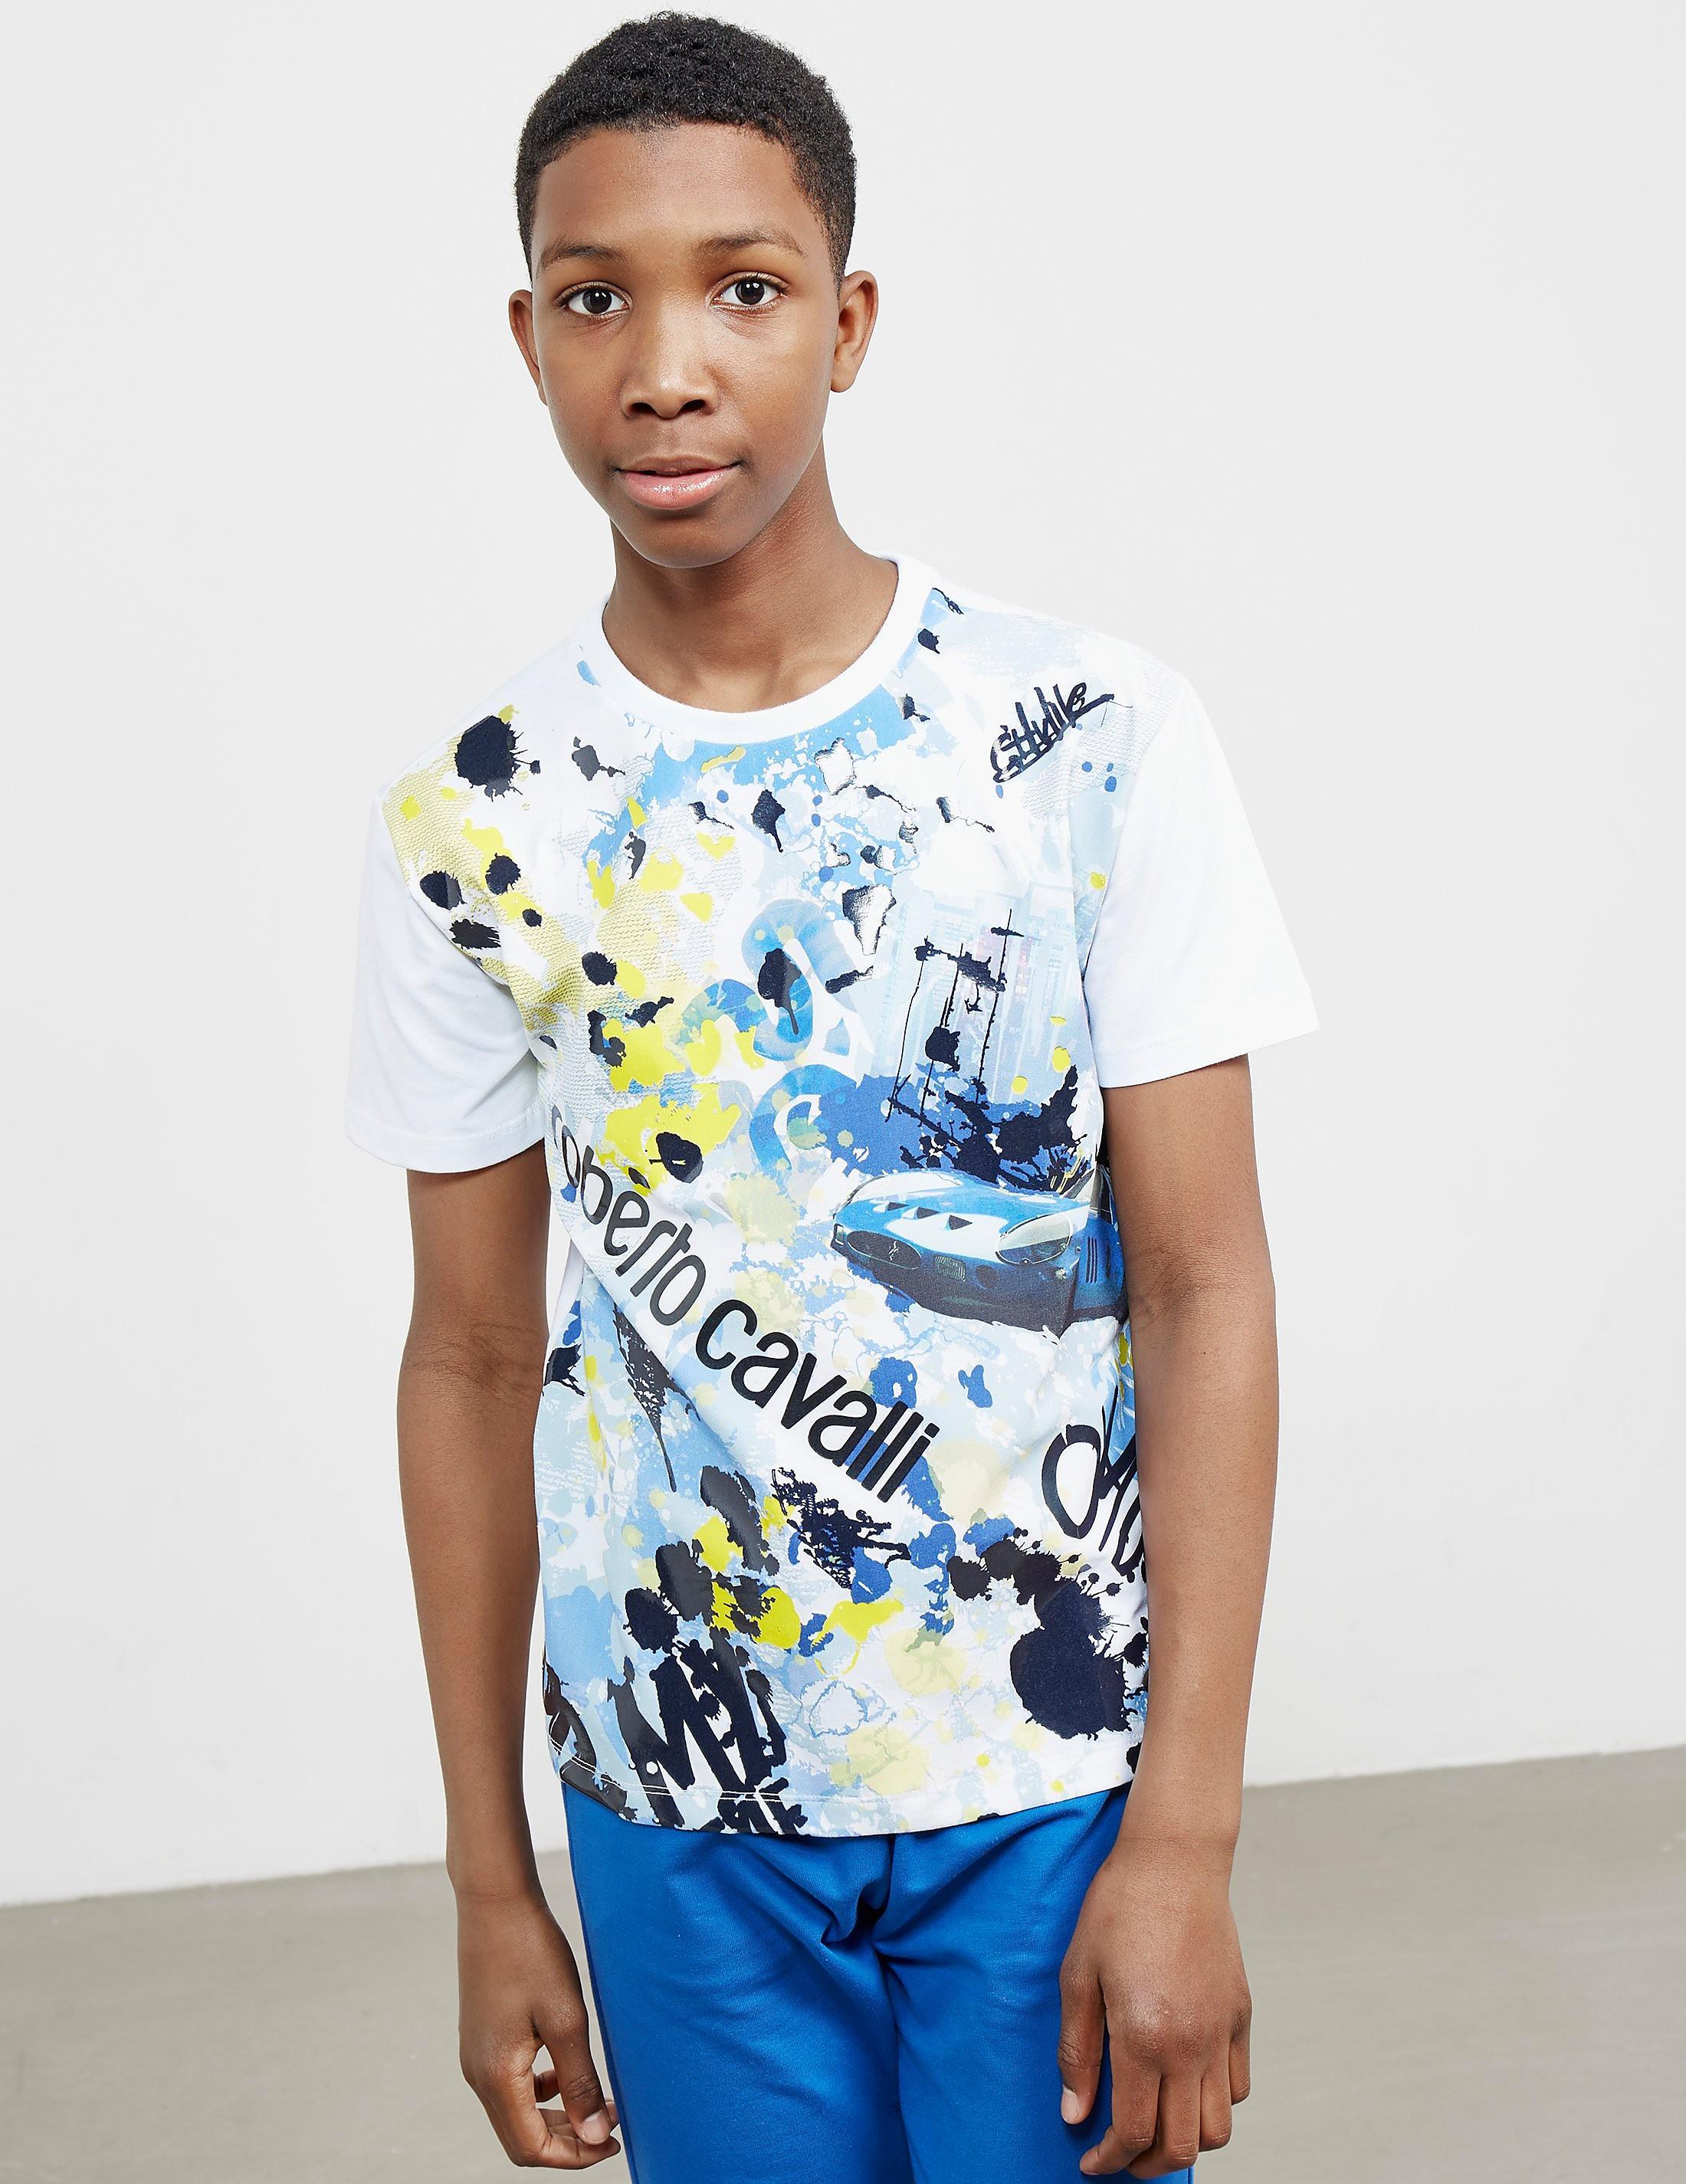 Just Cavalli Art City Short Sleeve T-Shirt